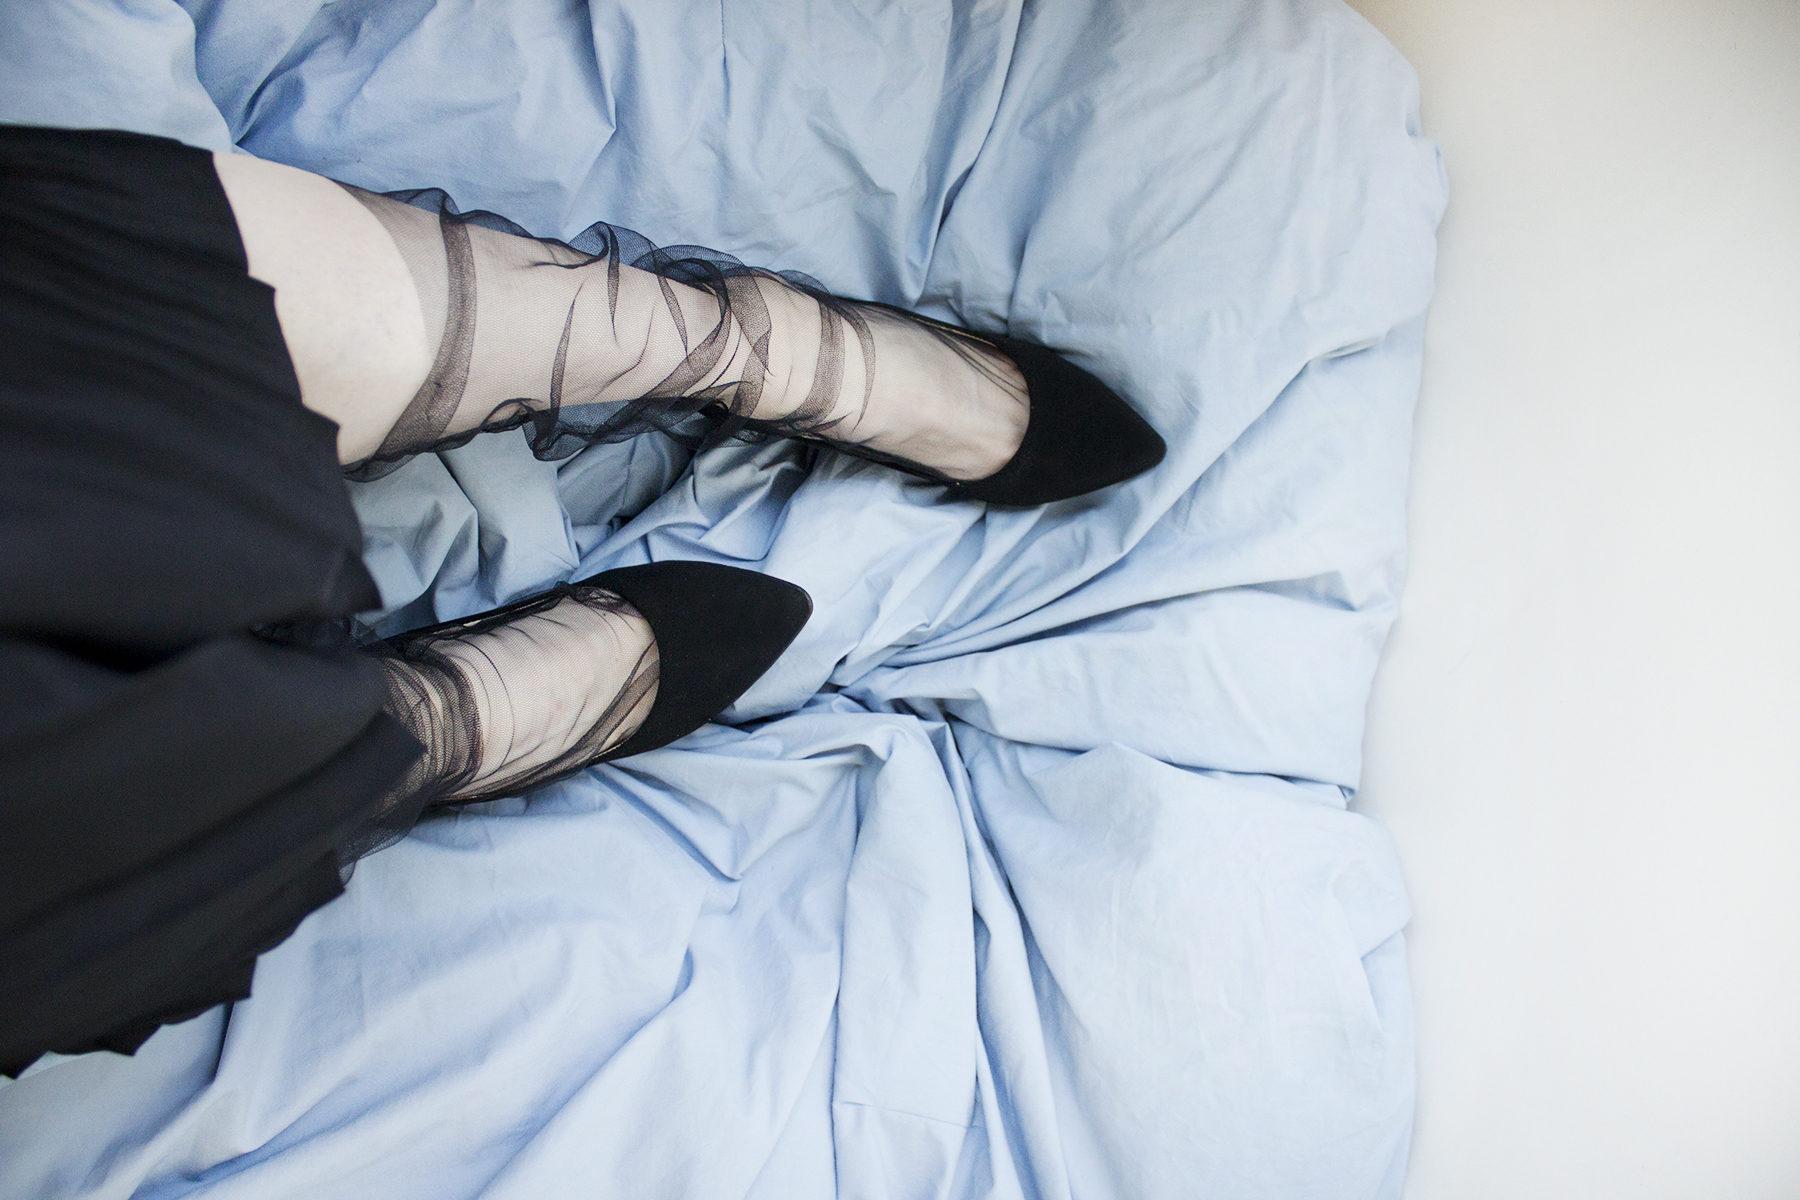 DIY Tulle Socks